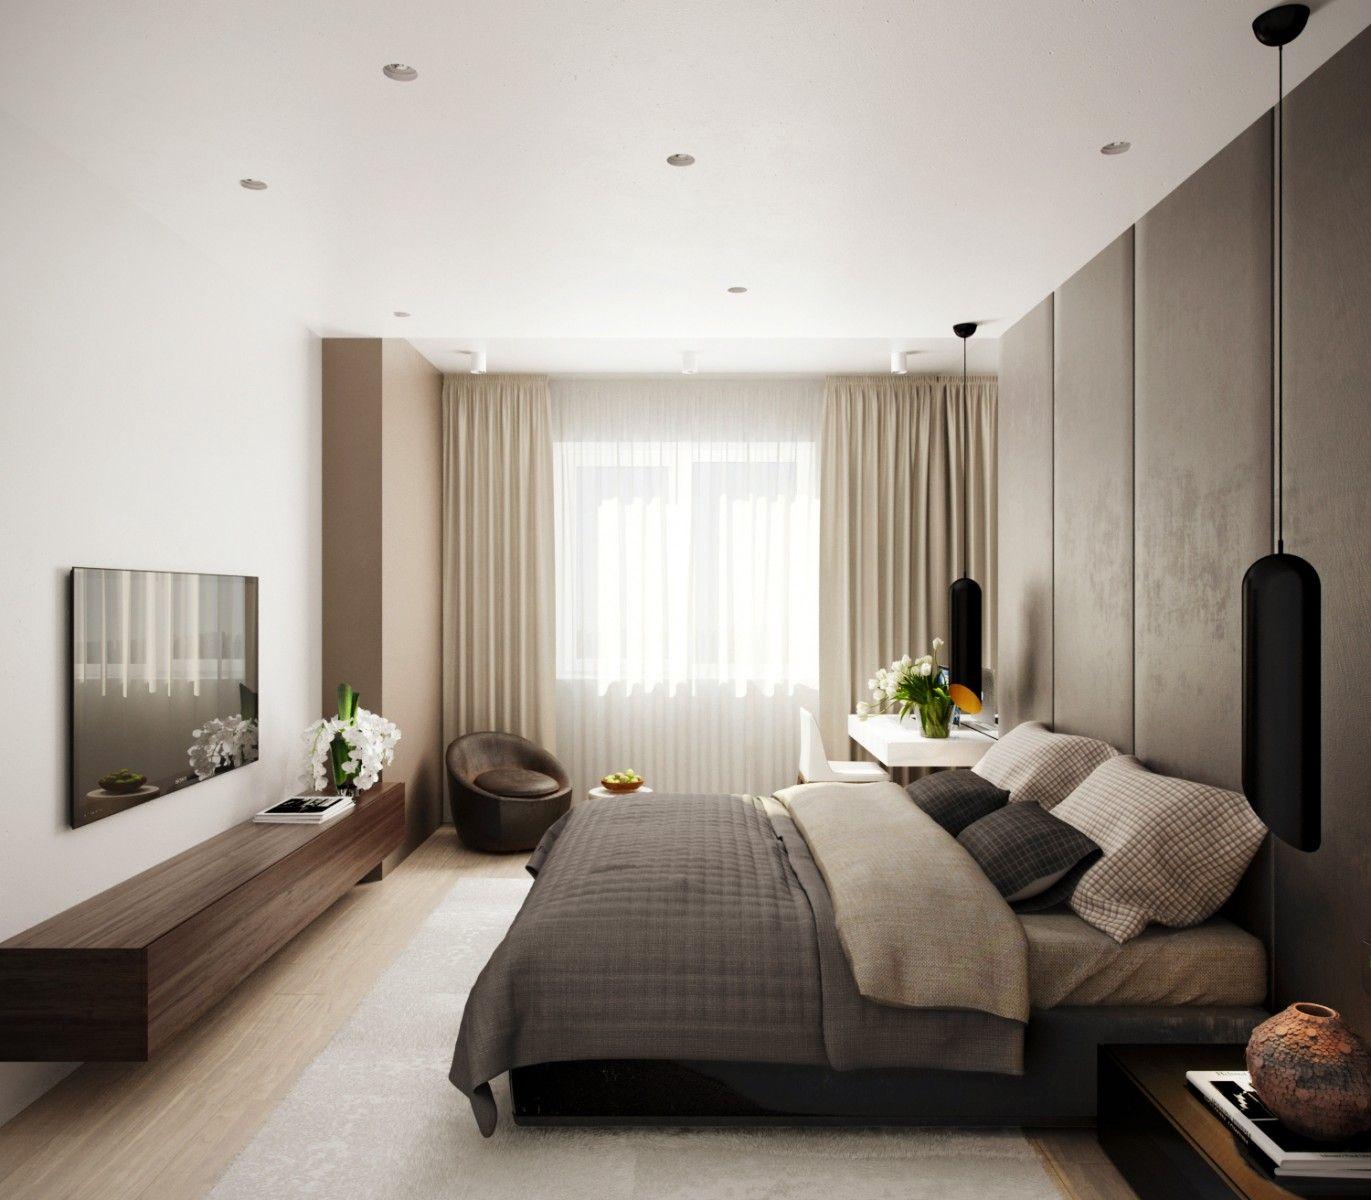 Apartment for musician for Dormitorio principal m6 deco